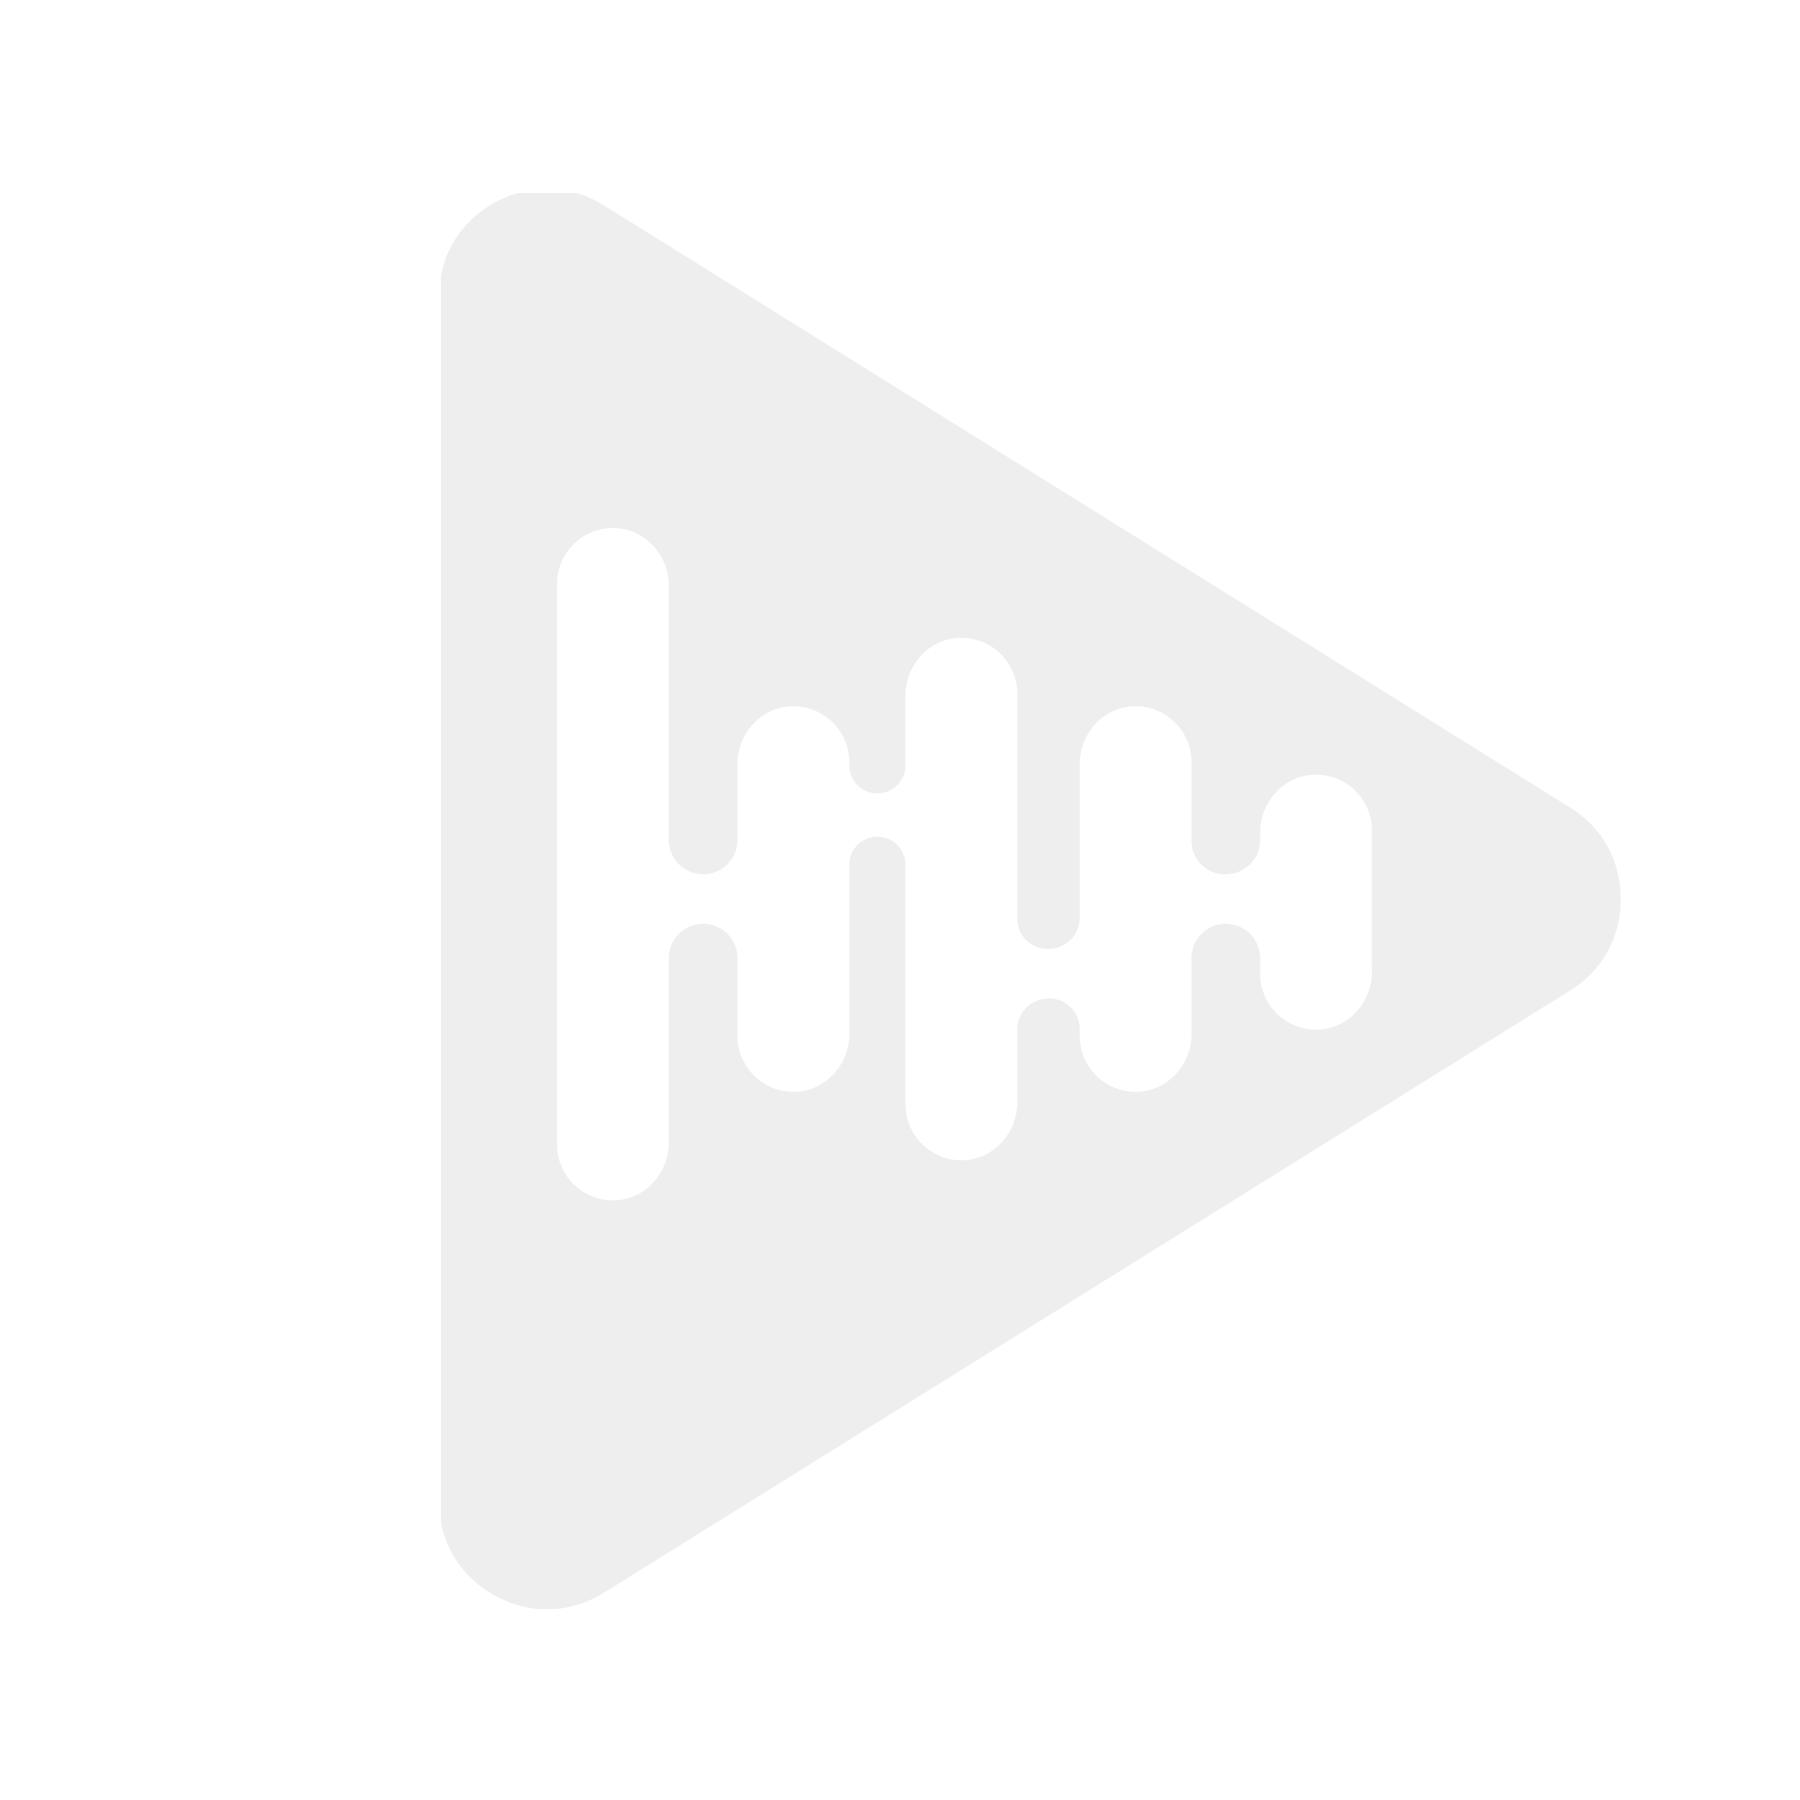 Incartec 25-518-PDC